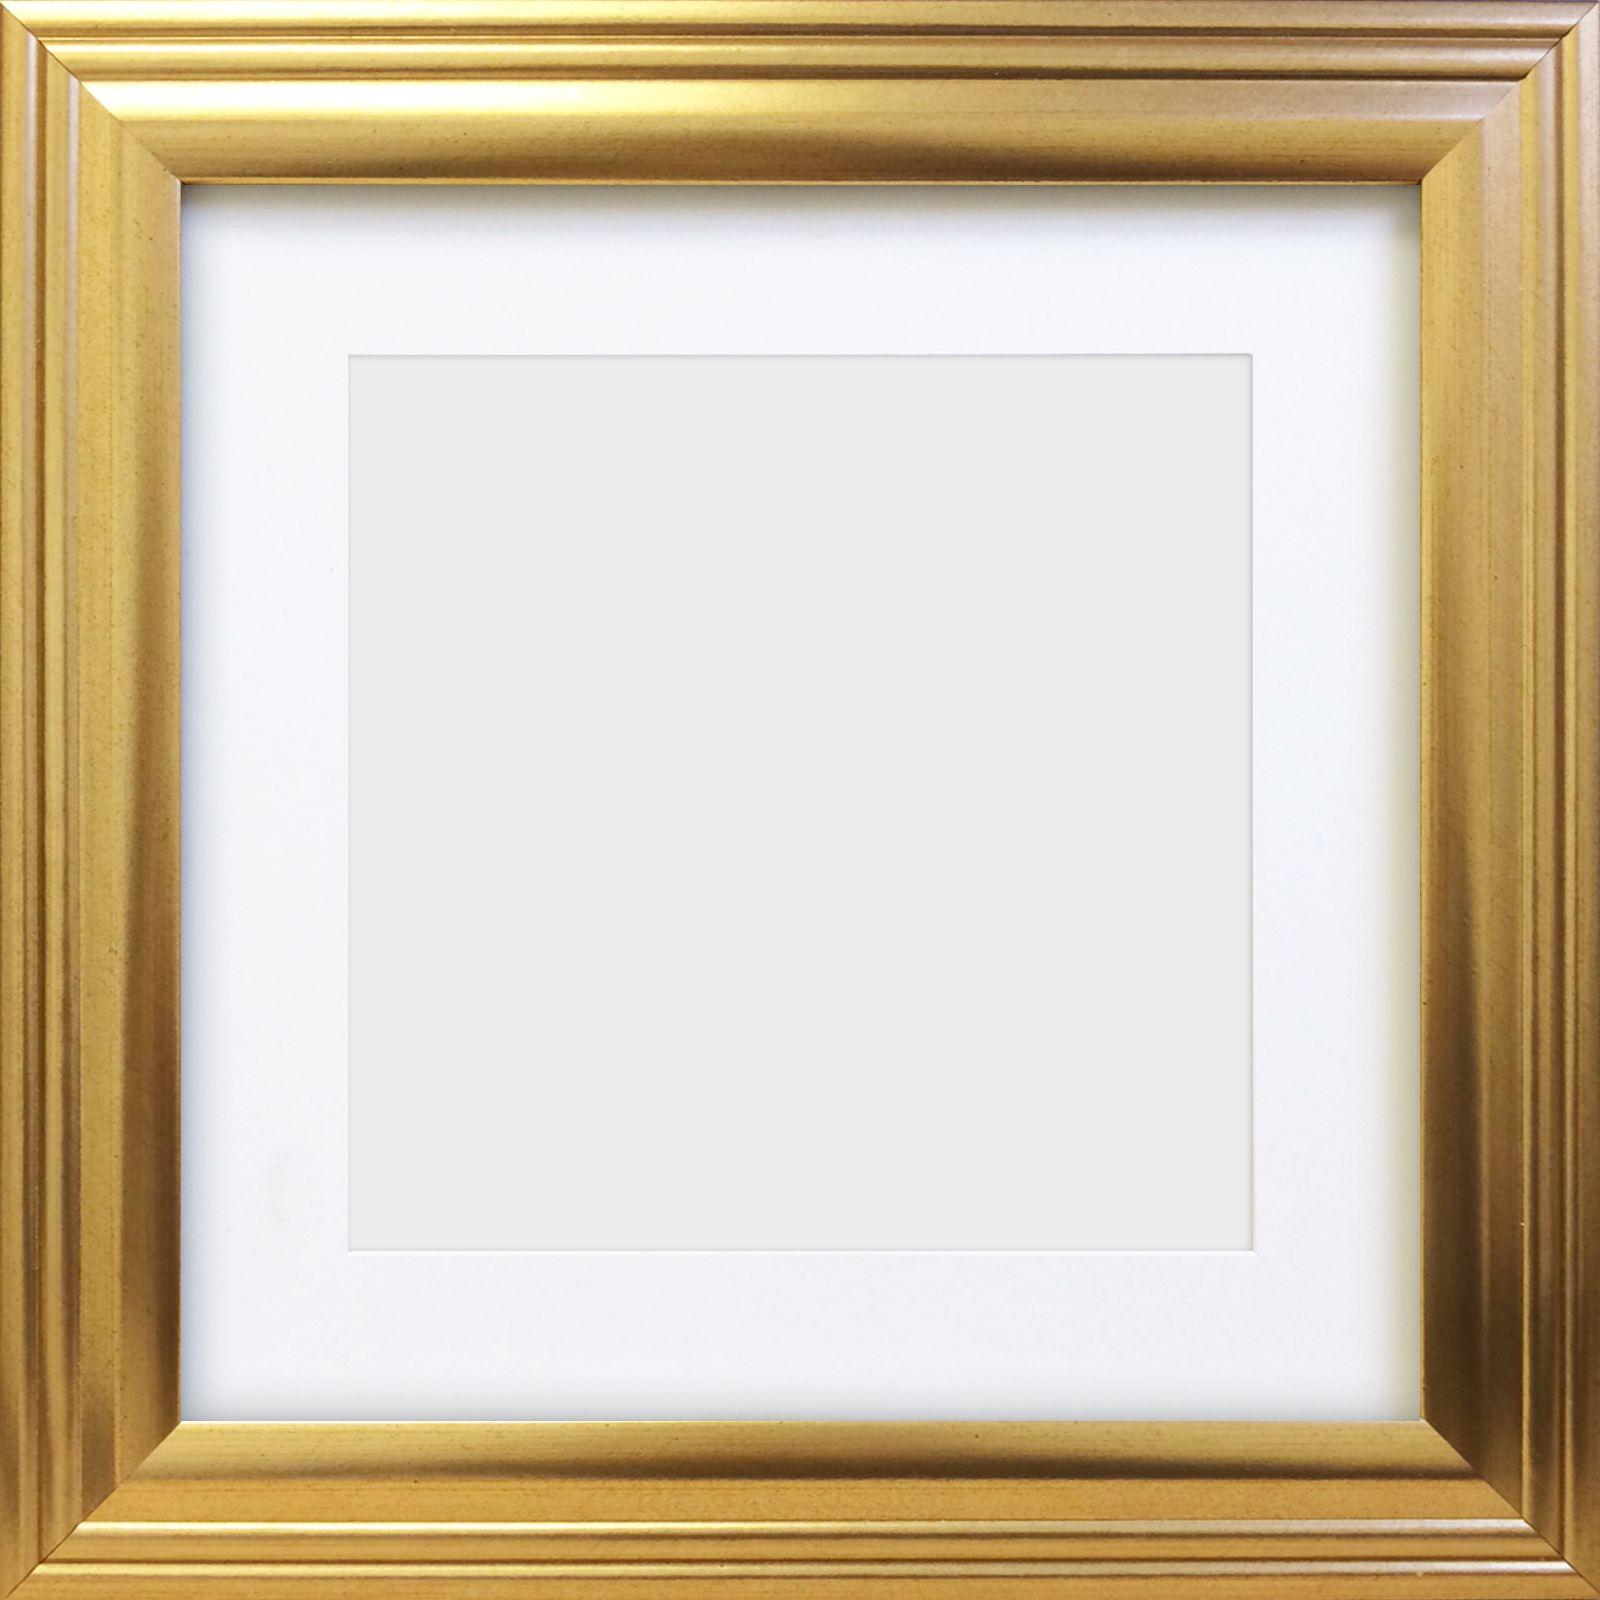 10x10 vintage gold 2806889548jpg 16001600